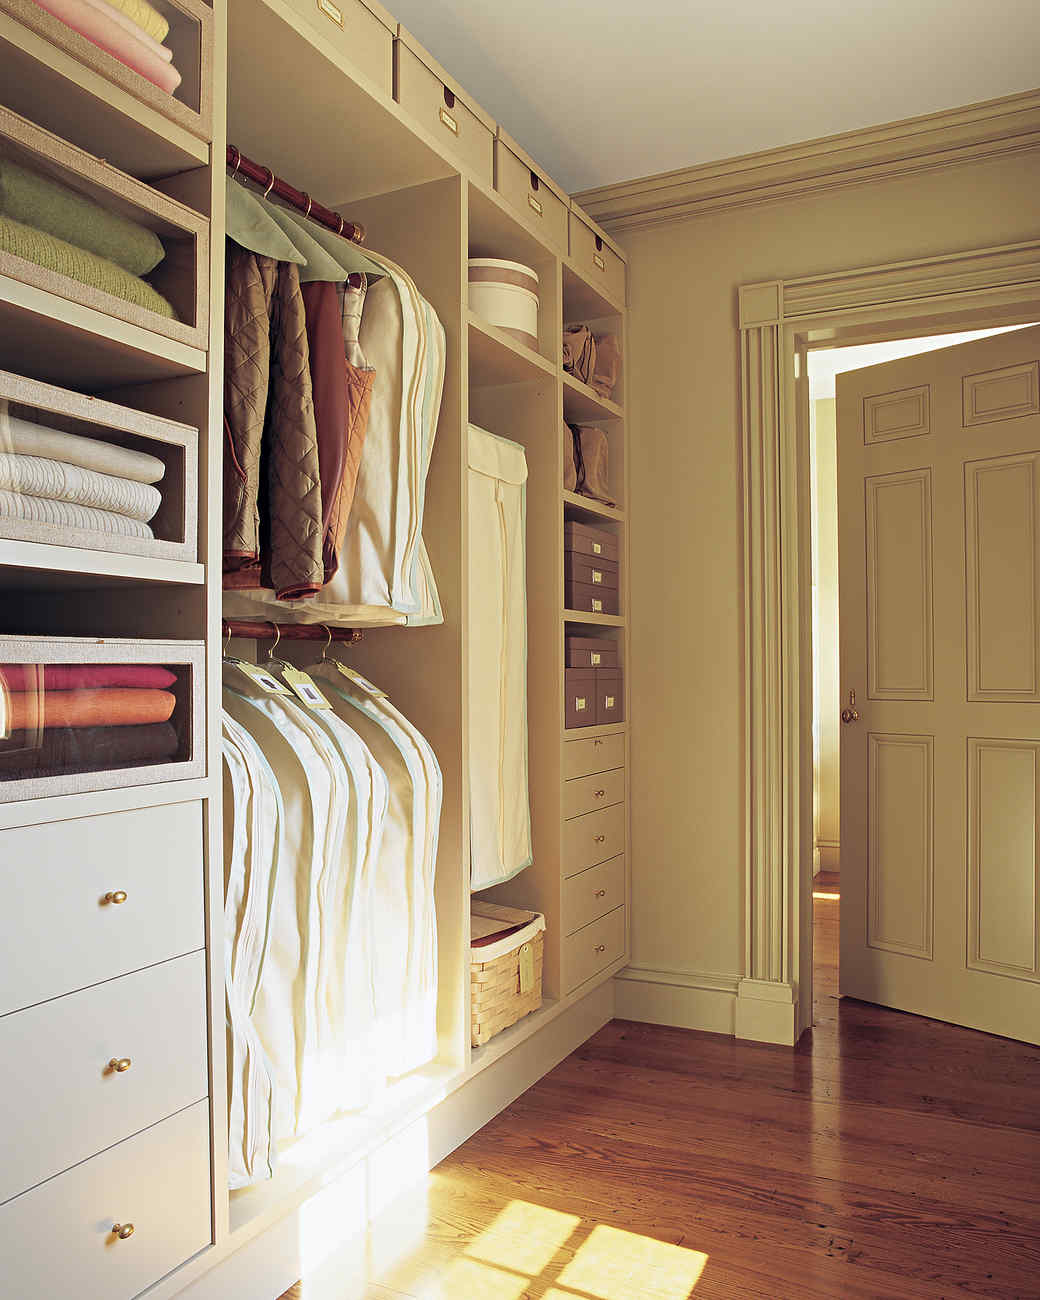 mla_104332_0109_closet.jpg